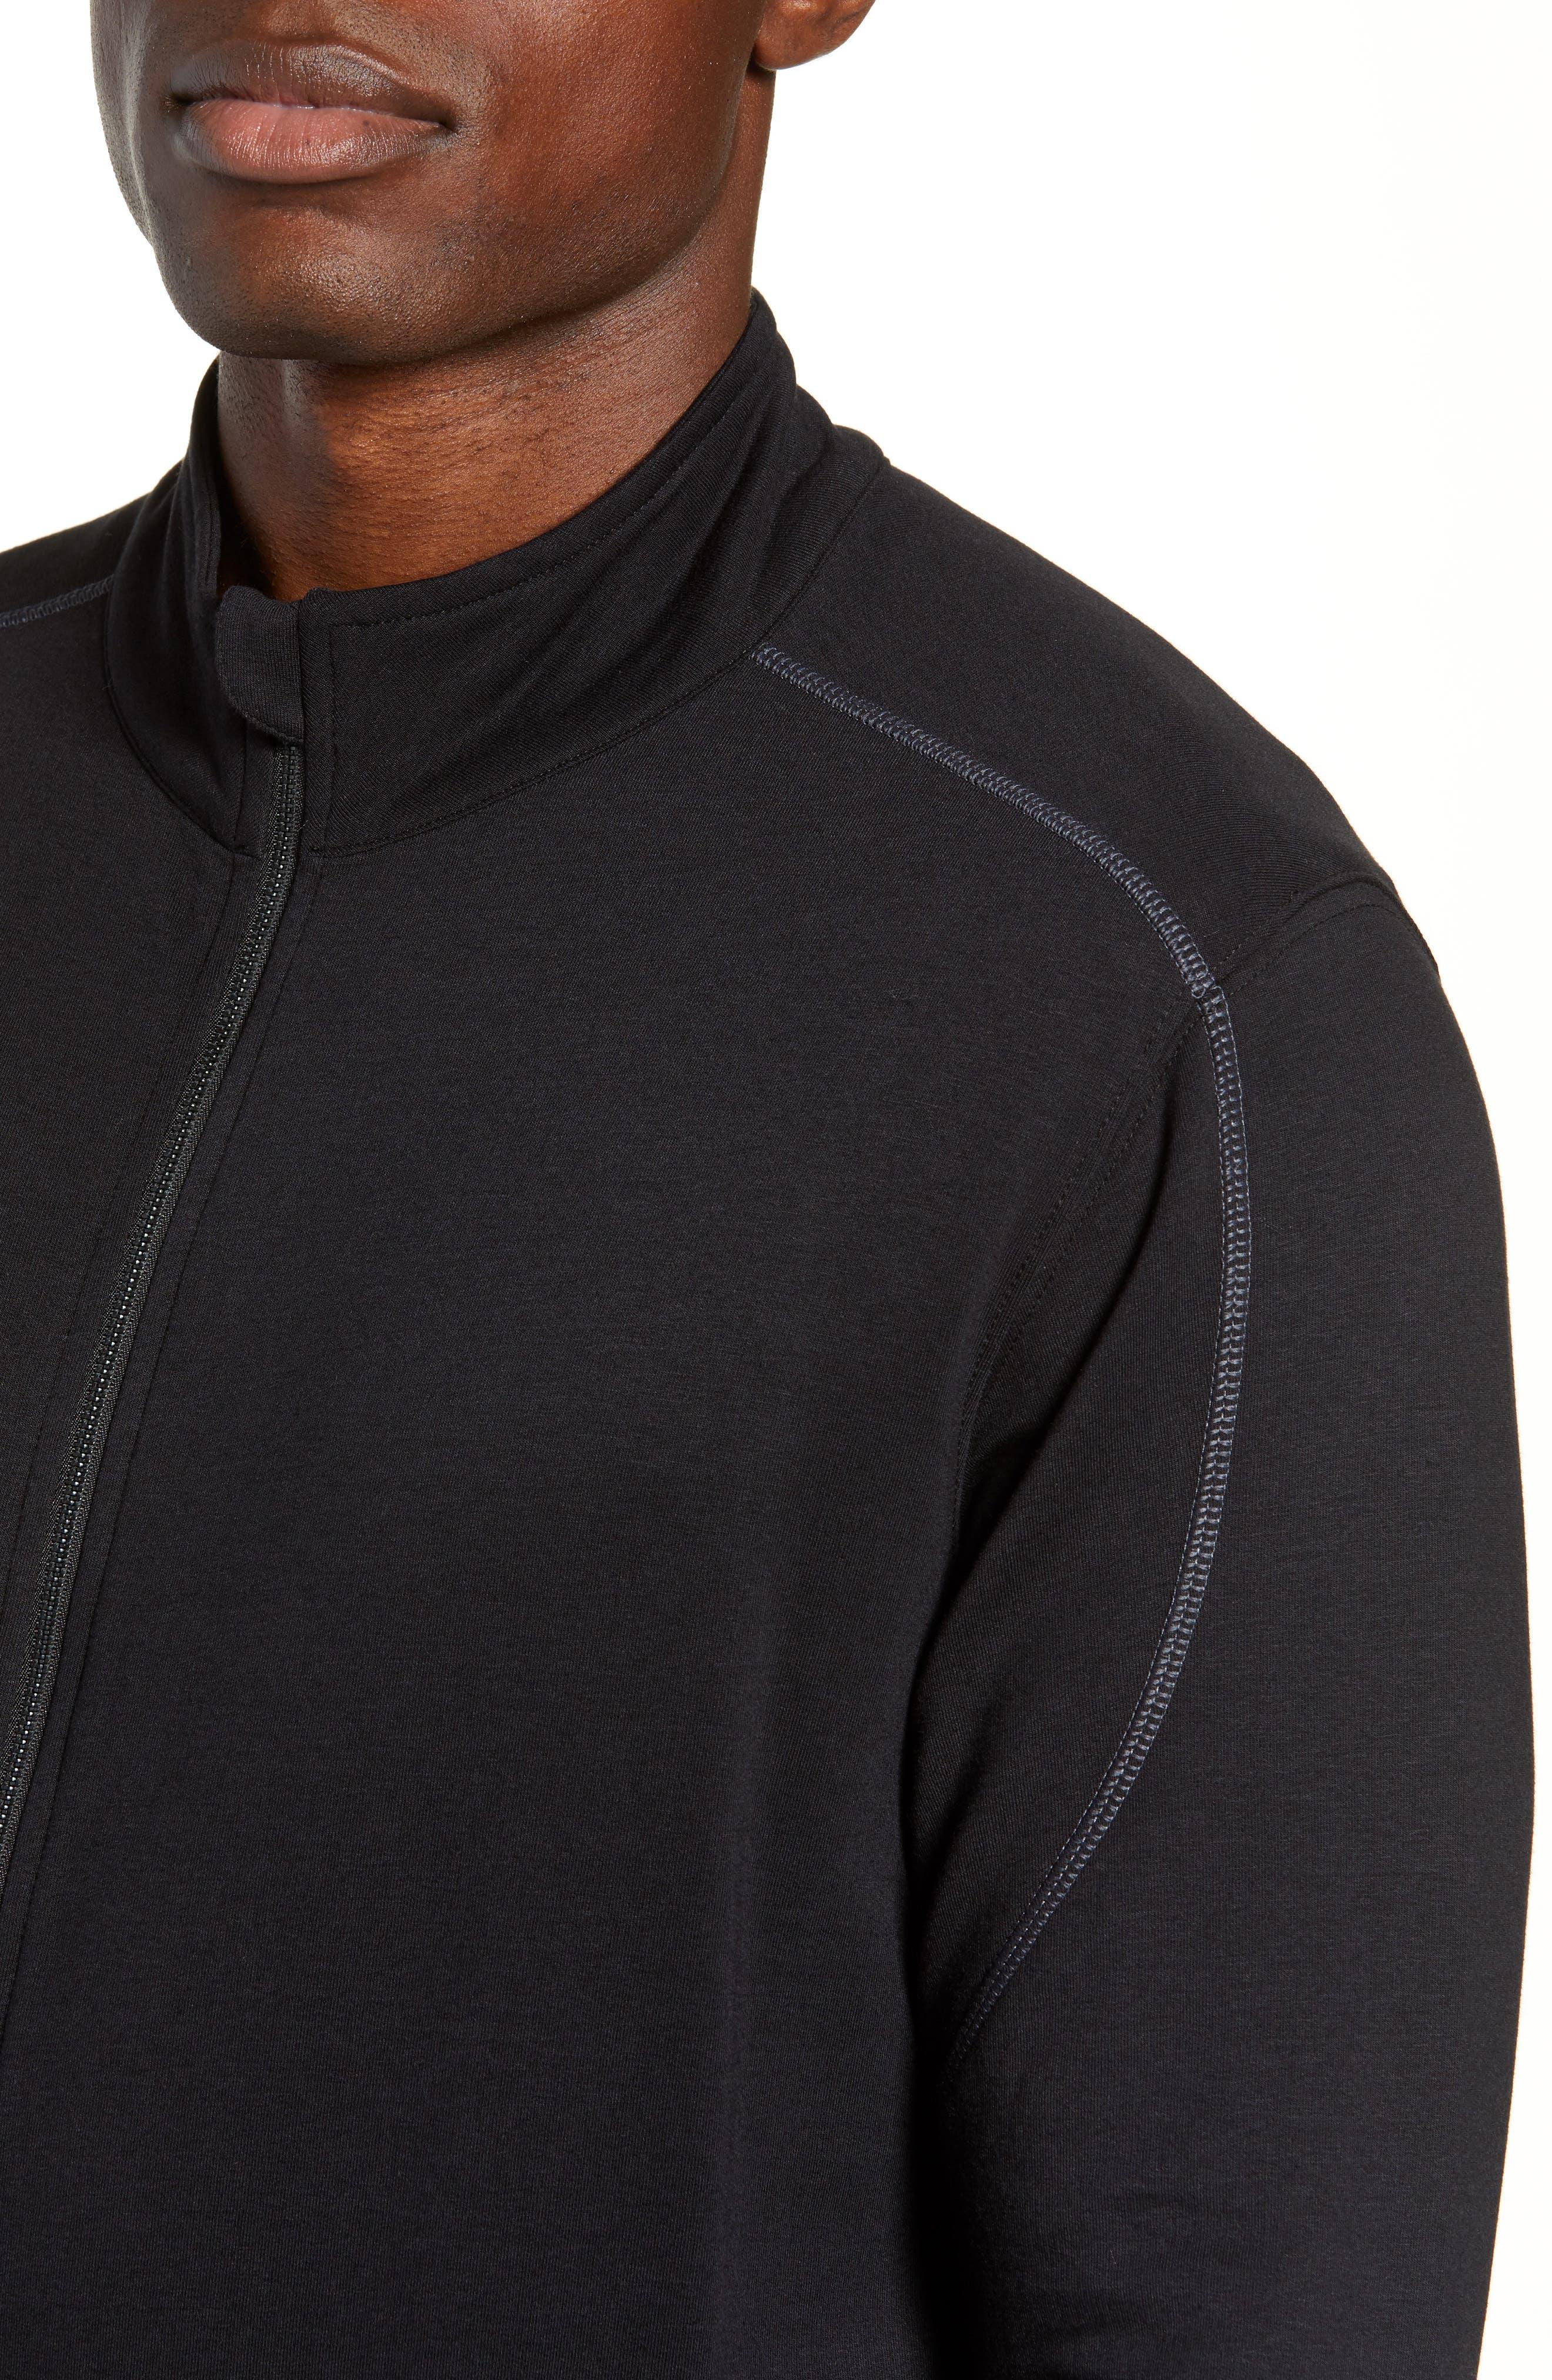 Tahoe II Fleece Jacket,                             Alternate thumbnail 4, color,                             BLACK